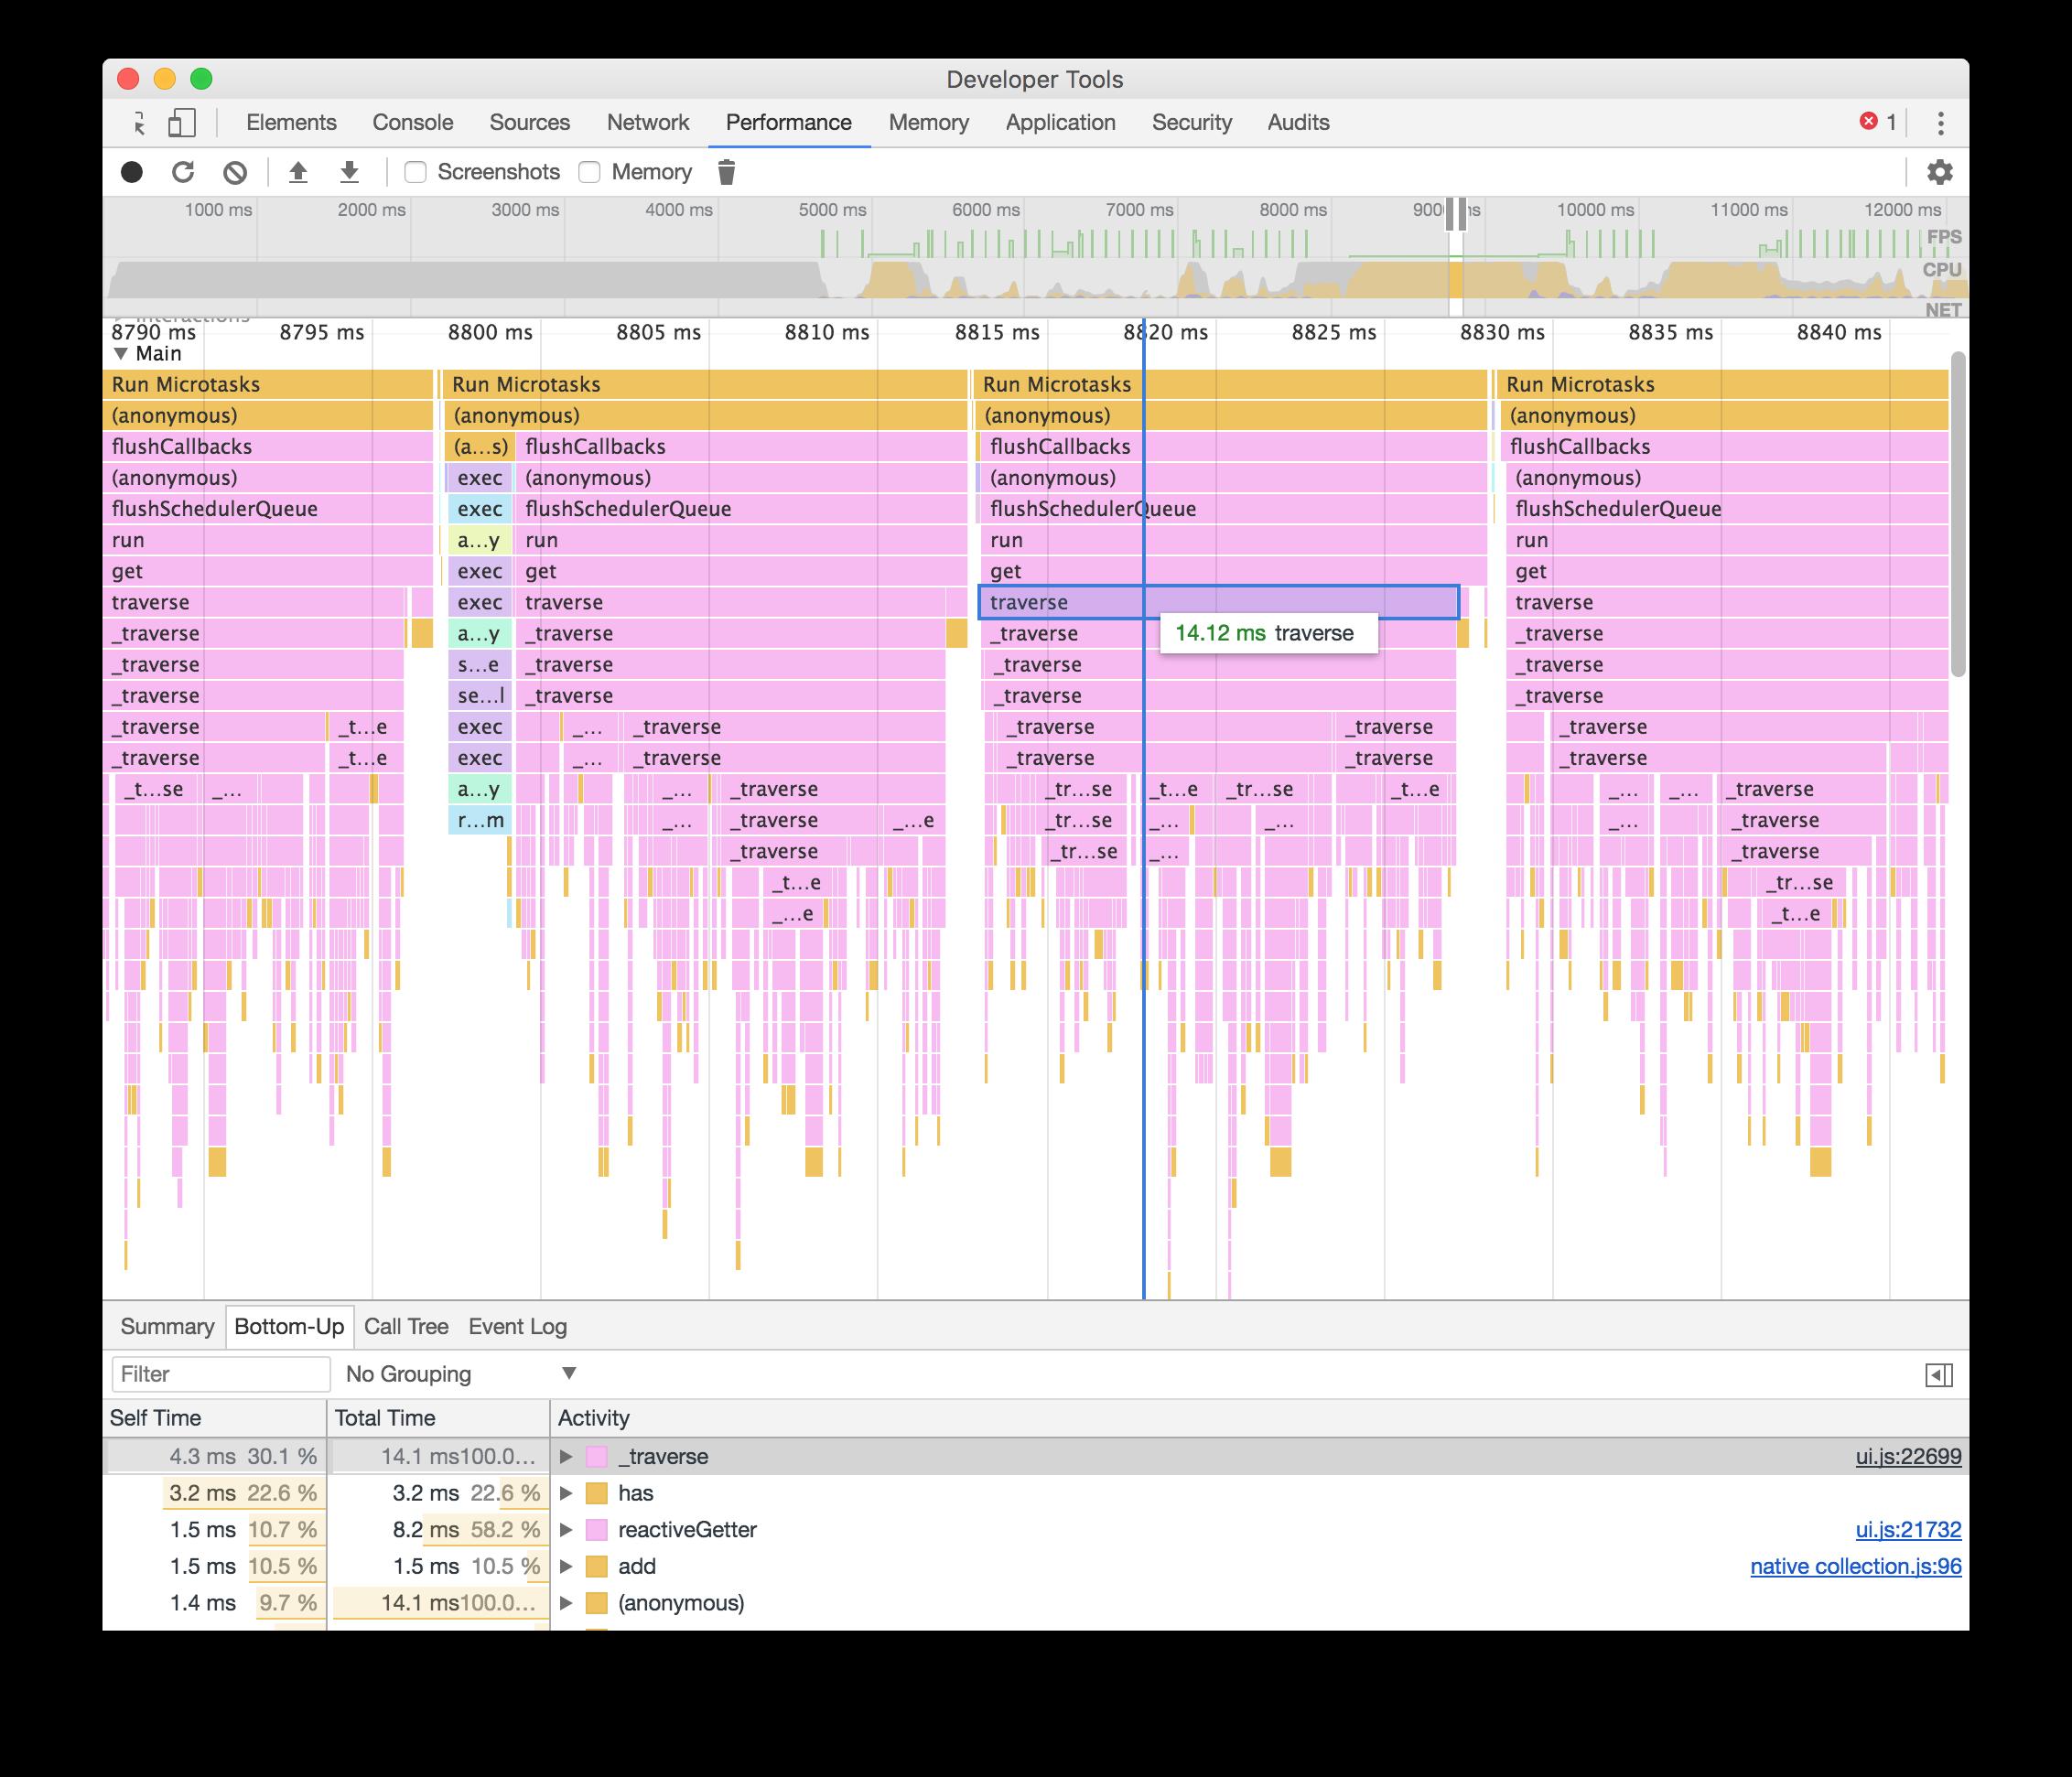 Micro-optimizing asynchronous updates - Get Help - Vue Forum